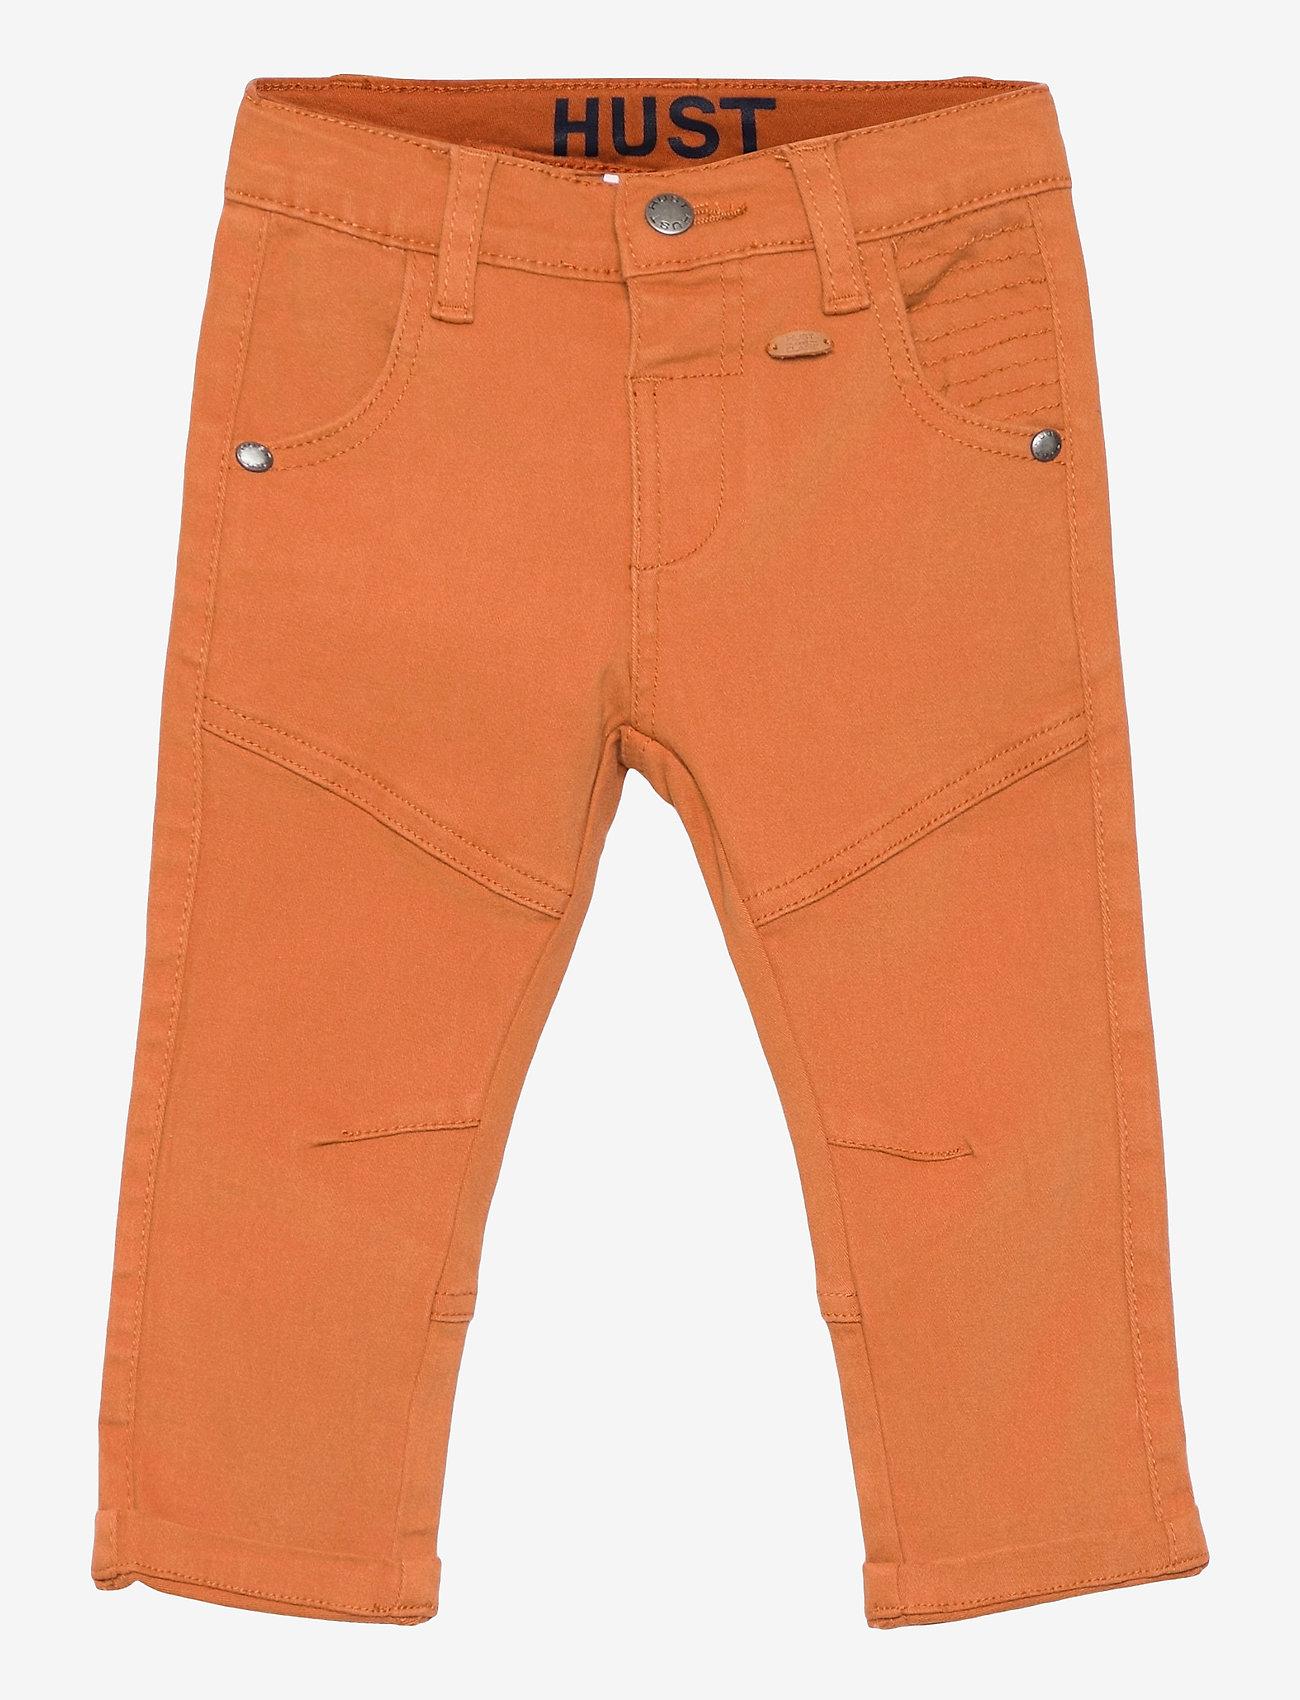 Hust & Claire - Jonas - Jeans - jeans - terracotta - 0